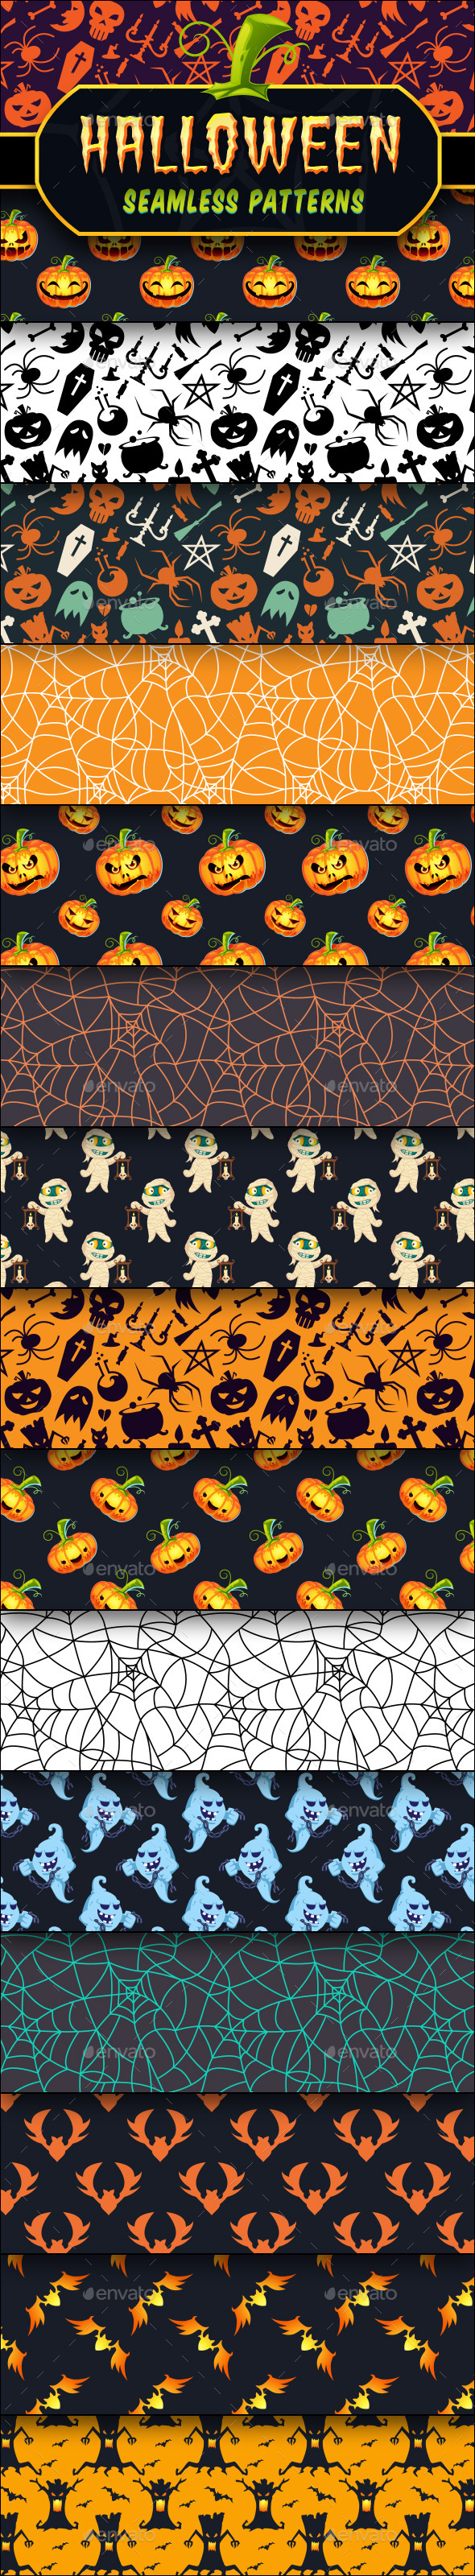 Halloween Seamless Patterns Set